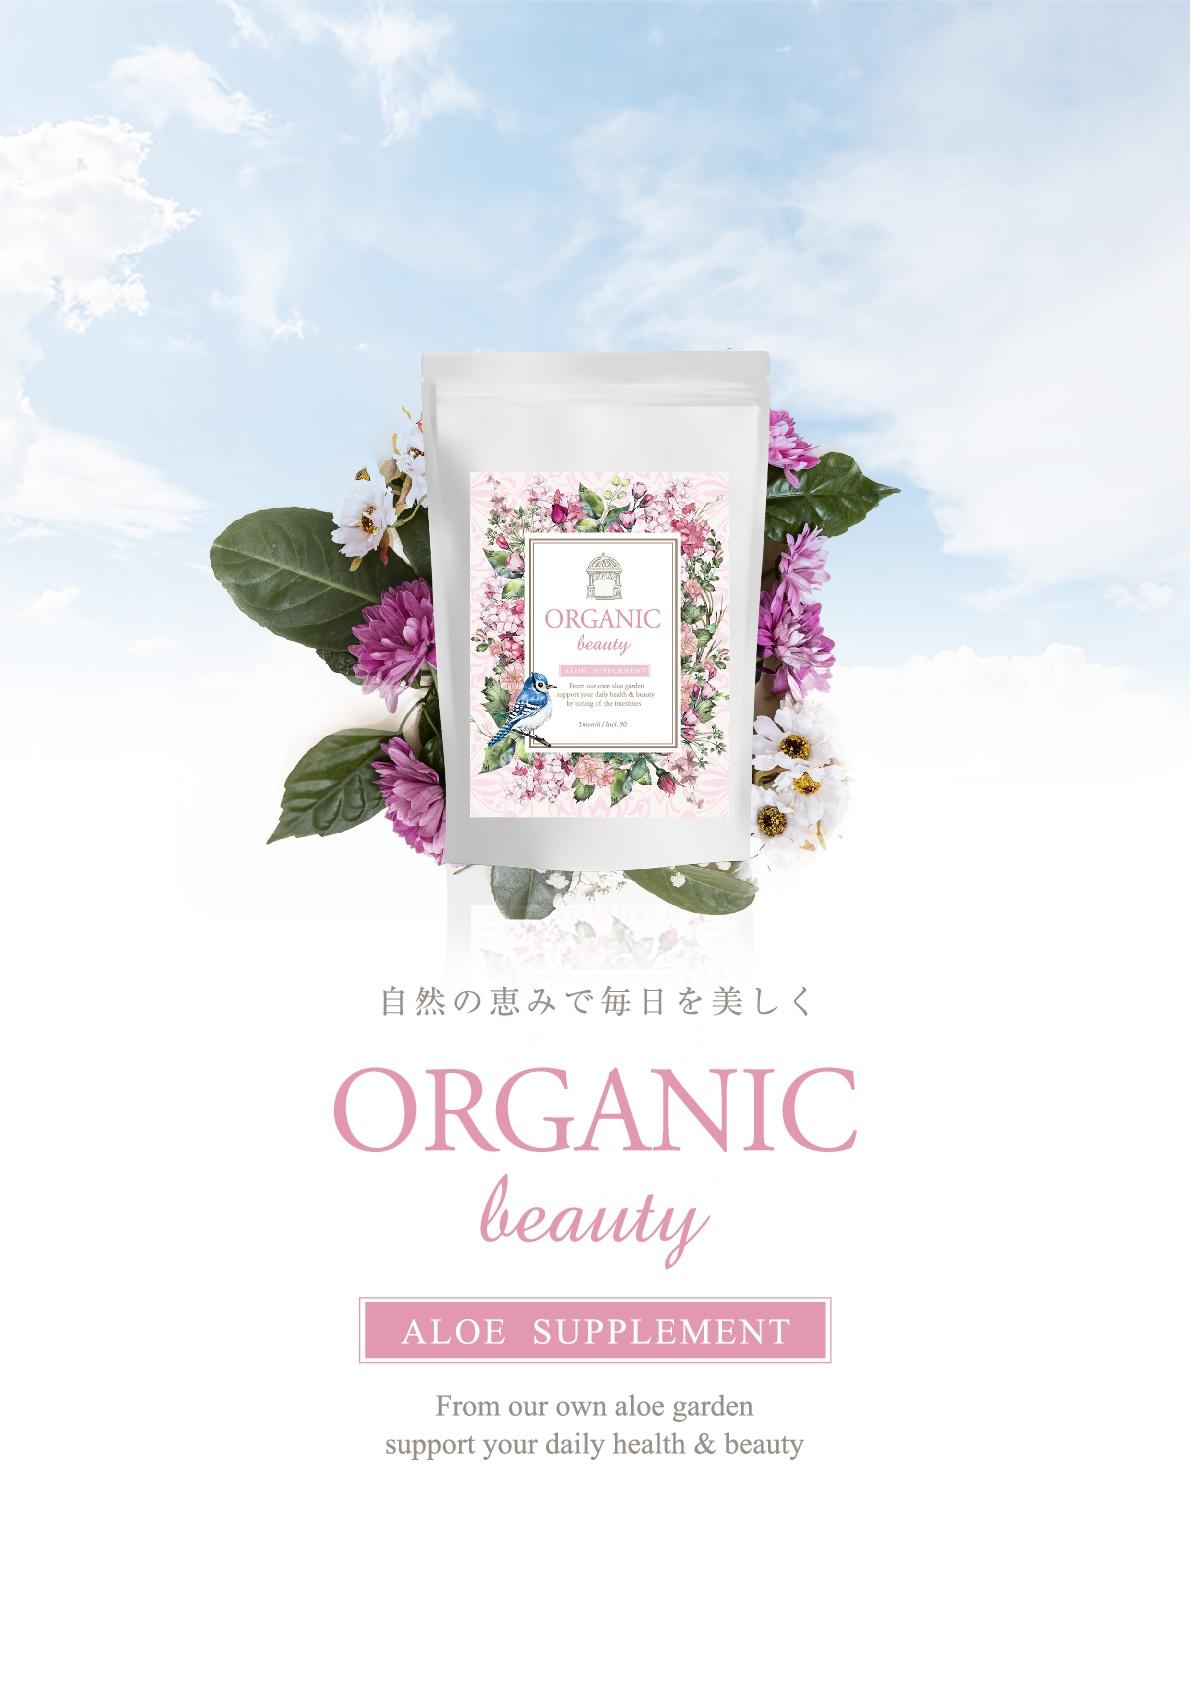 ORGANIC-beauty-001.jpg